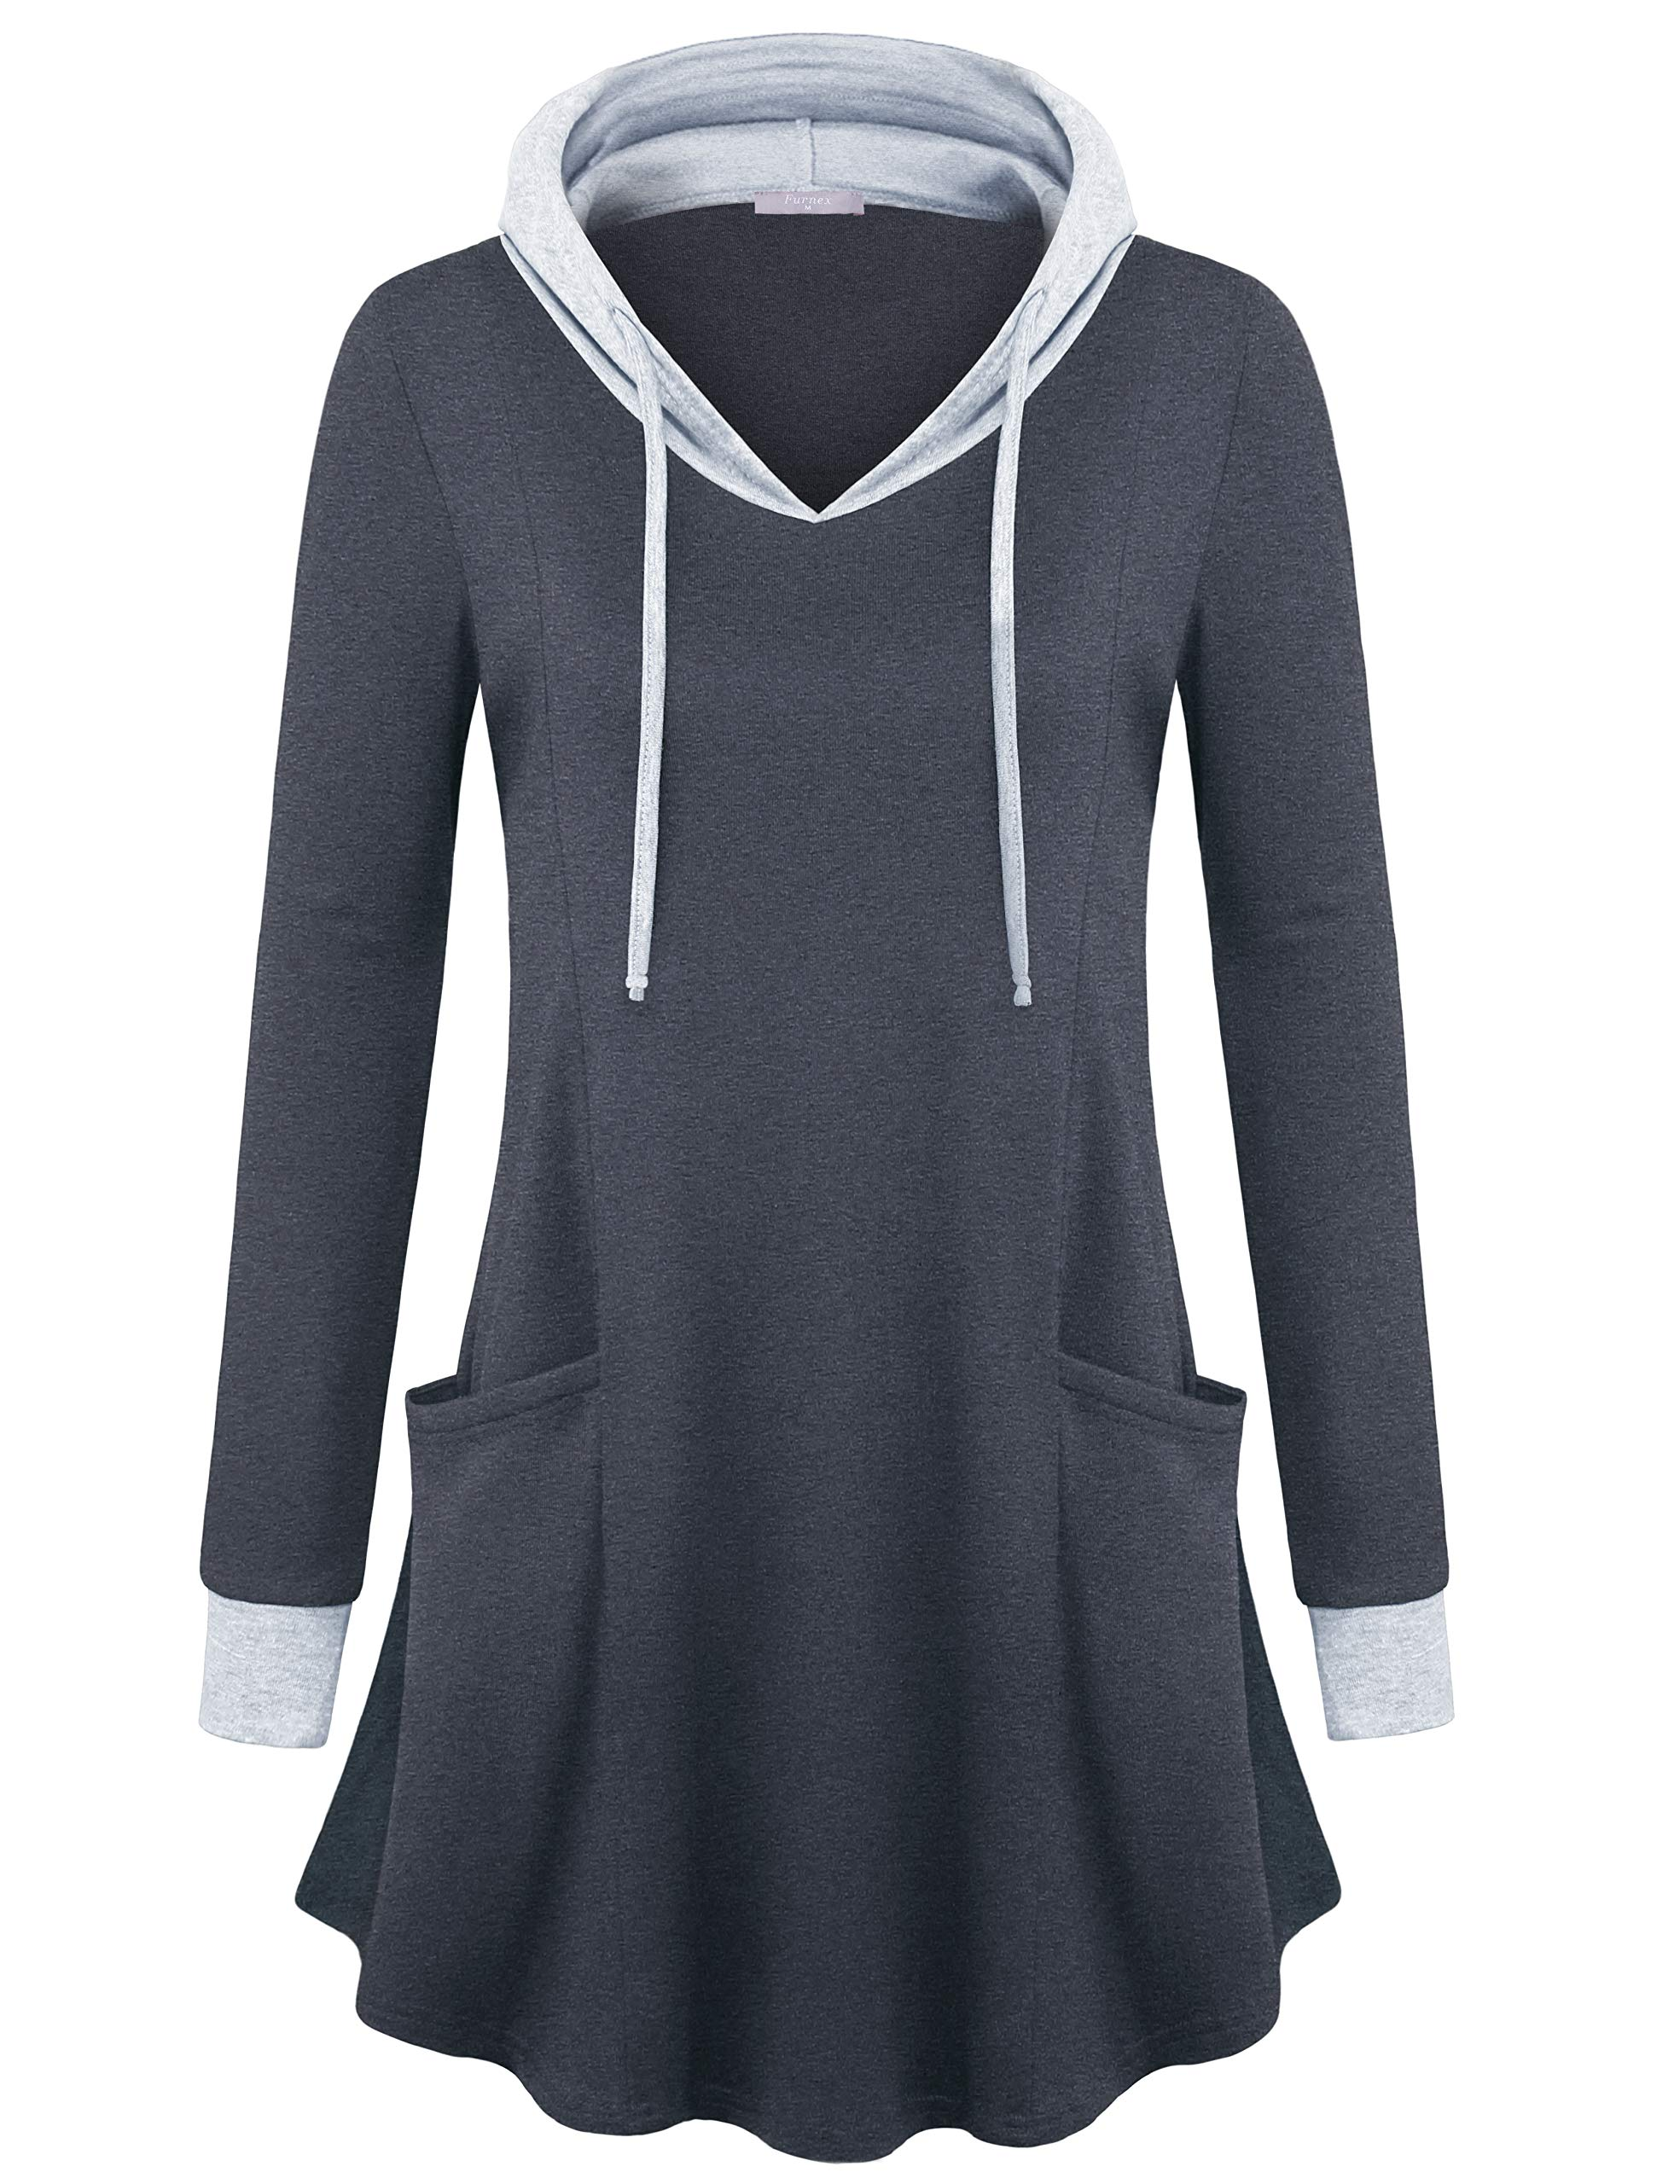 Furnex Sweatshirt Dresses, Ladies Cute Long Sleeve Pullover Tunic Hoodies Pocket V Neck Dressy Shirts Carbon Black Large